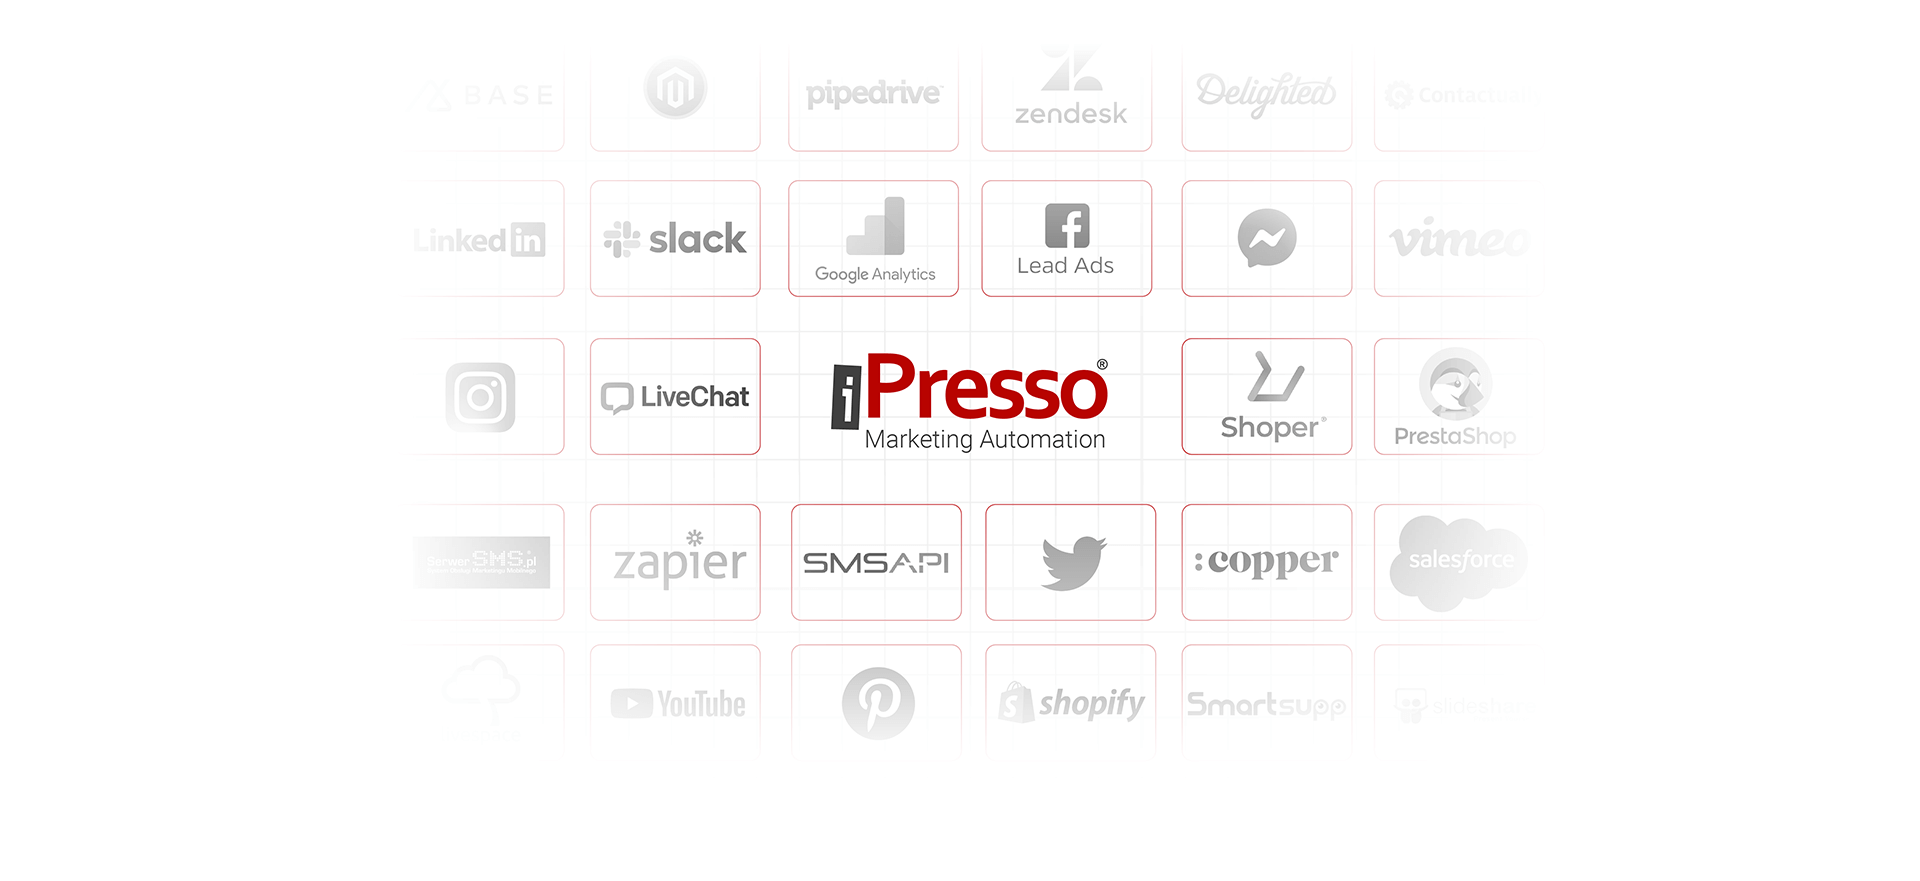 iPresso integrations